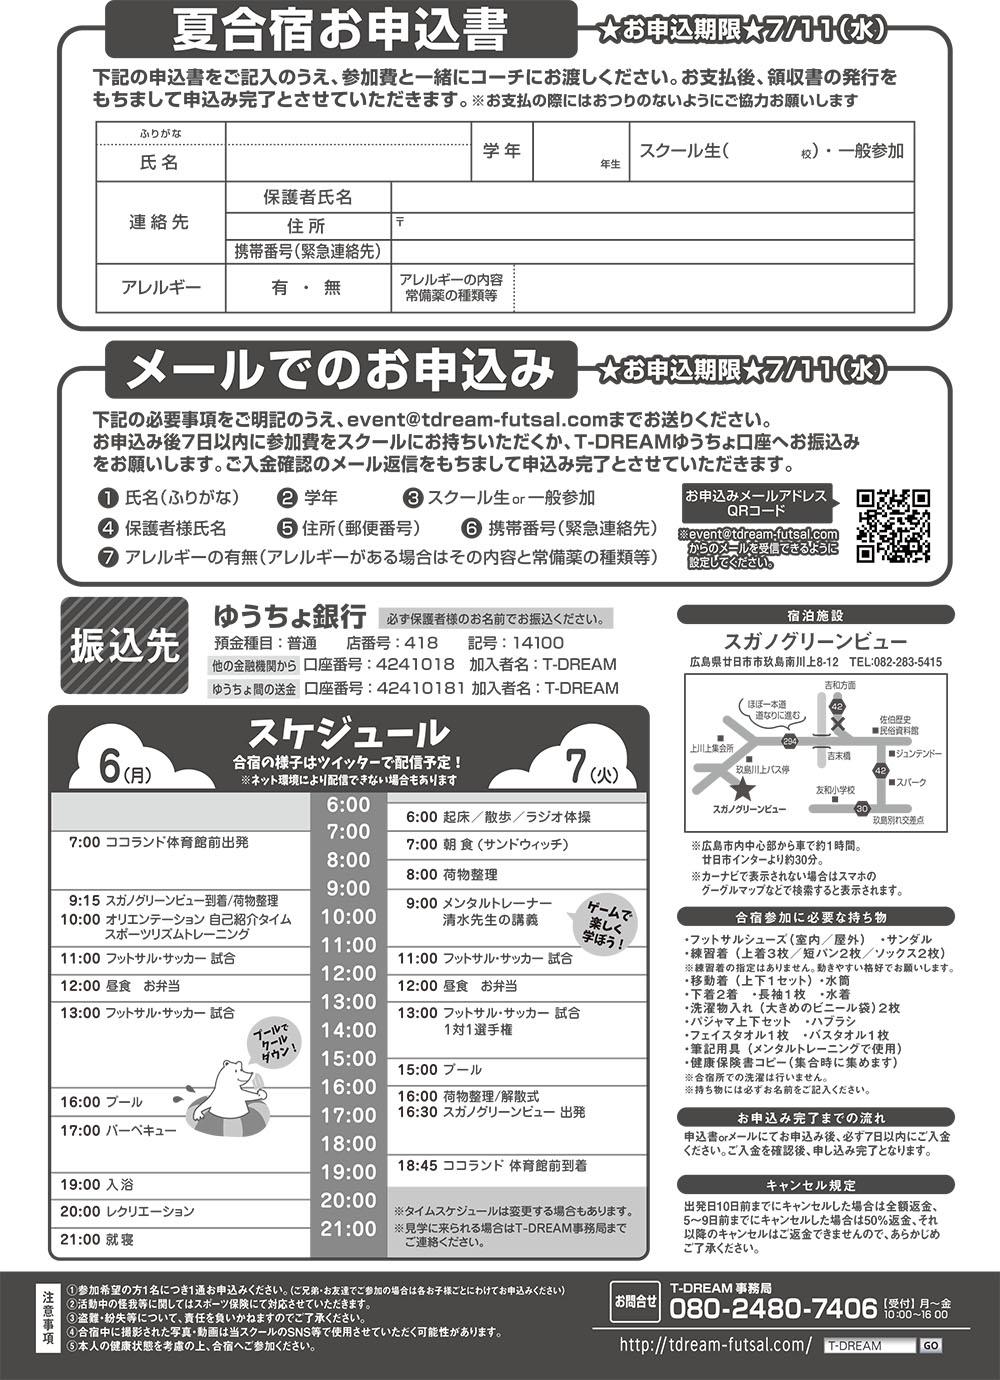 2018_yamaguchi456_ura